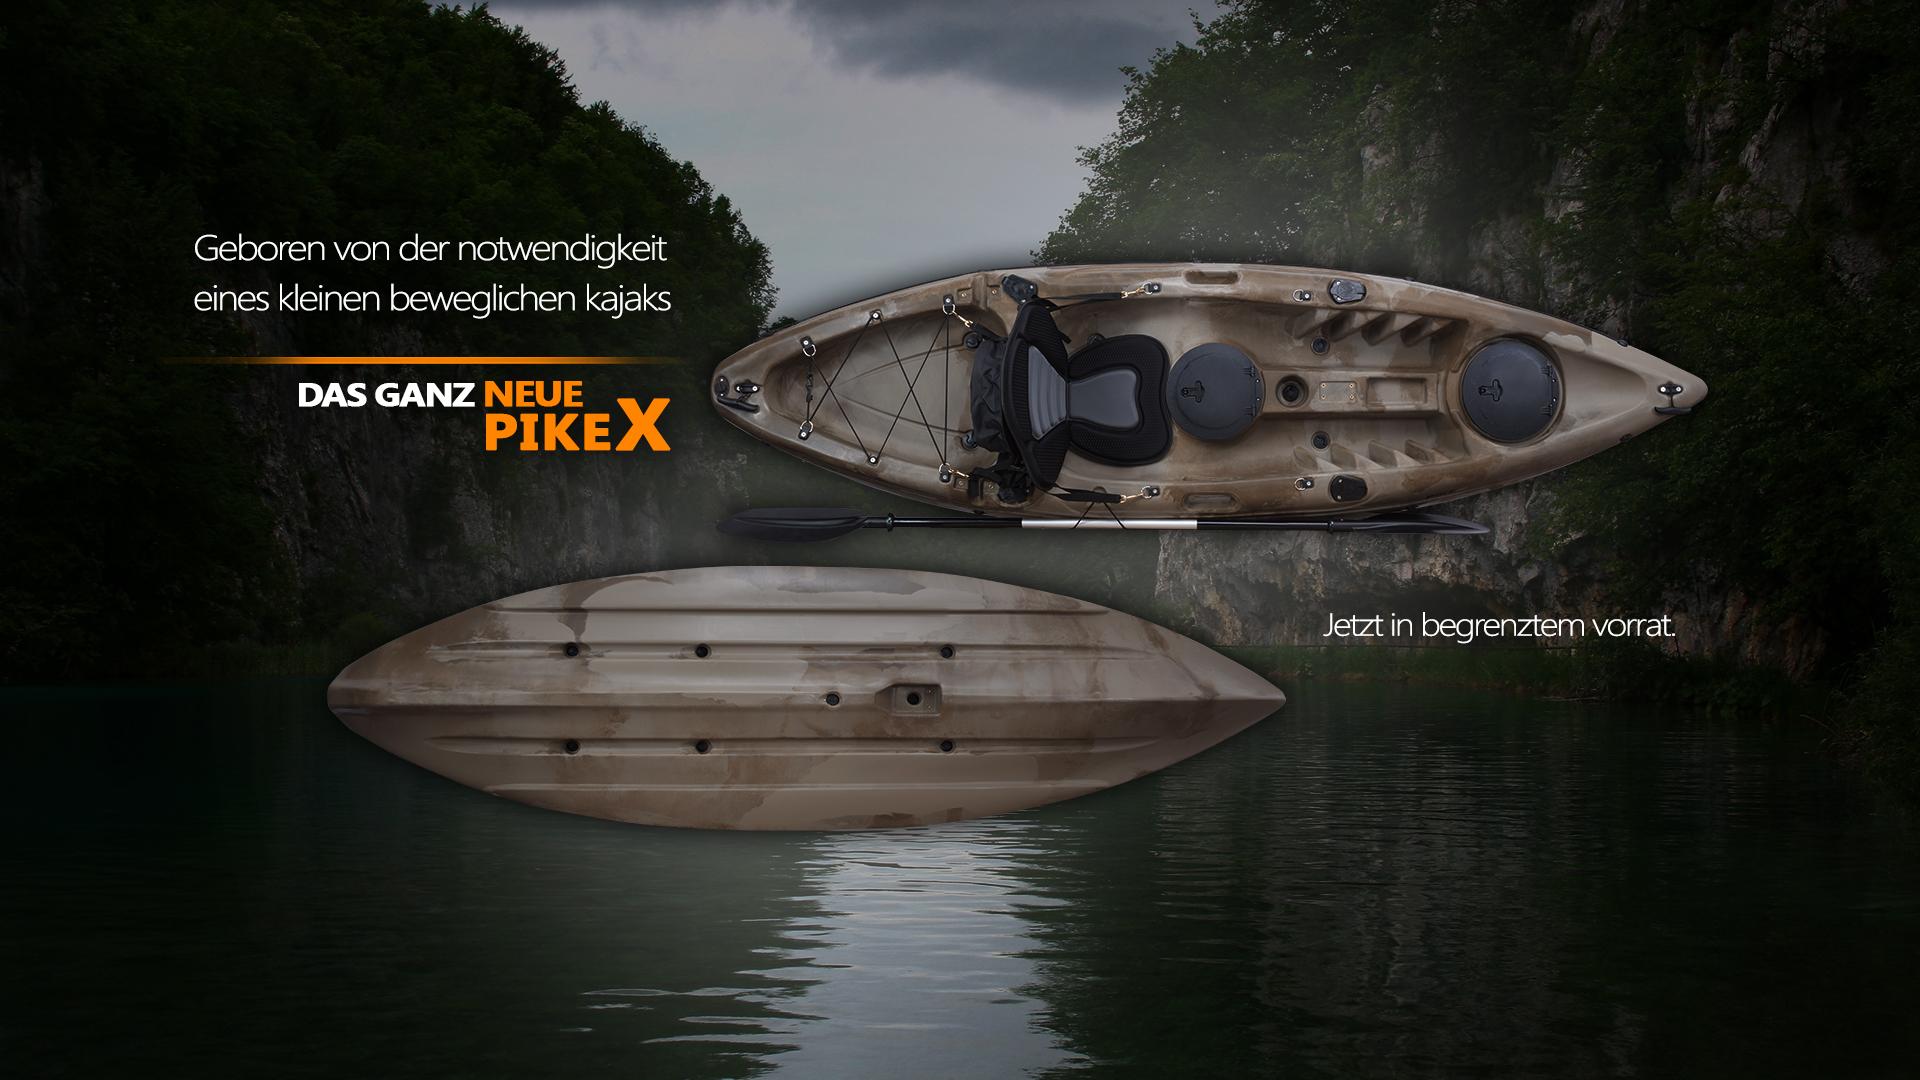 Angelkajak Pike X